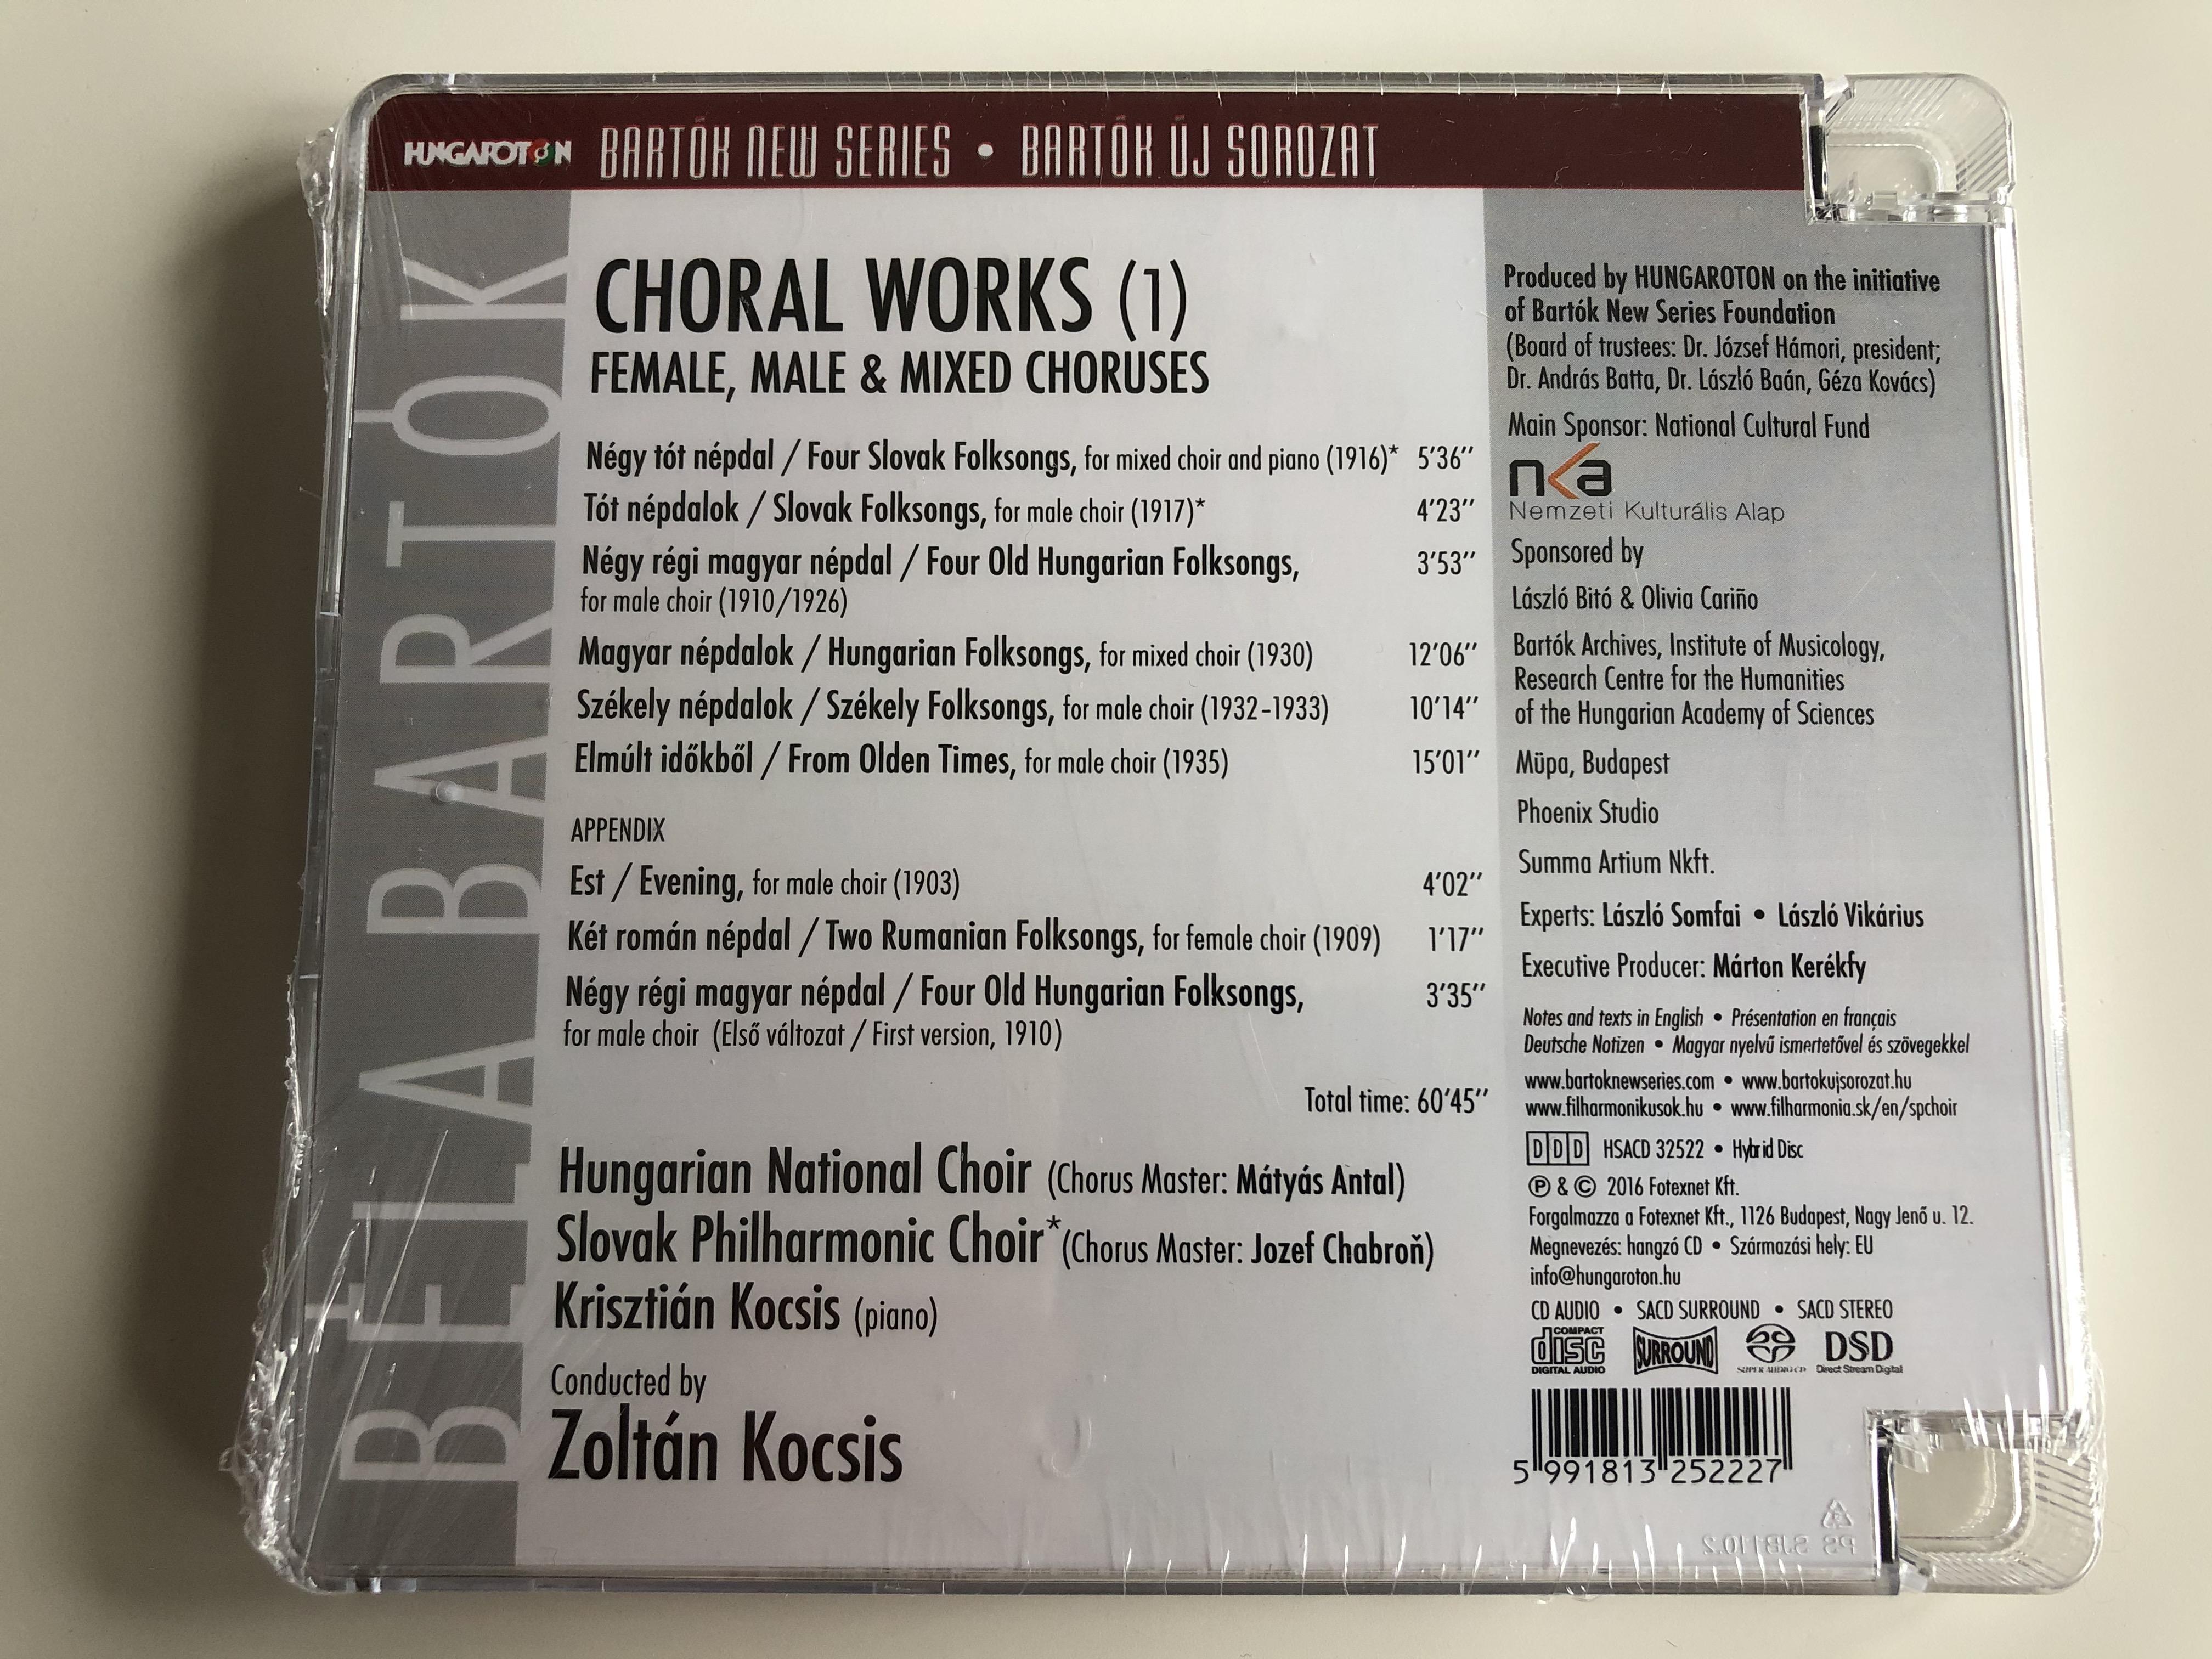 bela-bartok-choral-works-1-female-male-mixed-choruses-hungarian-national-choir-slovak-philharmonic-choir-kriszitan-kocsis-piano-zoltan-kocsis-bartok-new-series-hungaroton-audio-.jpg